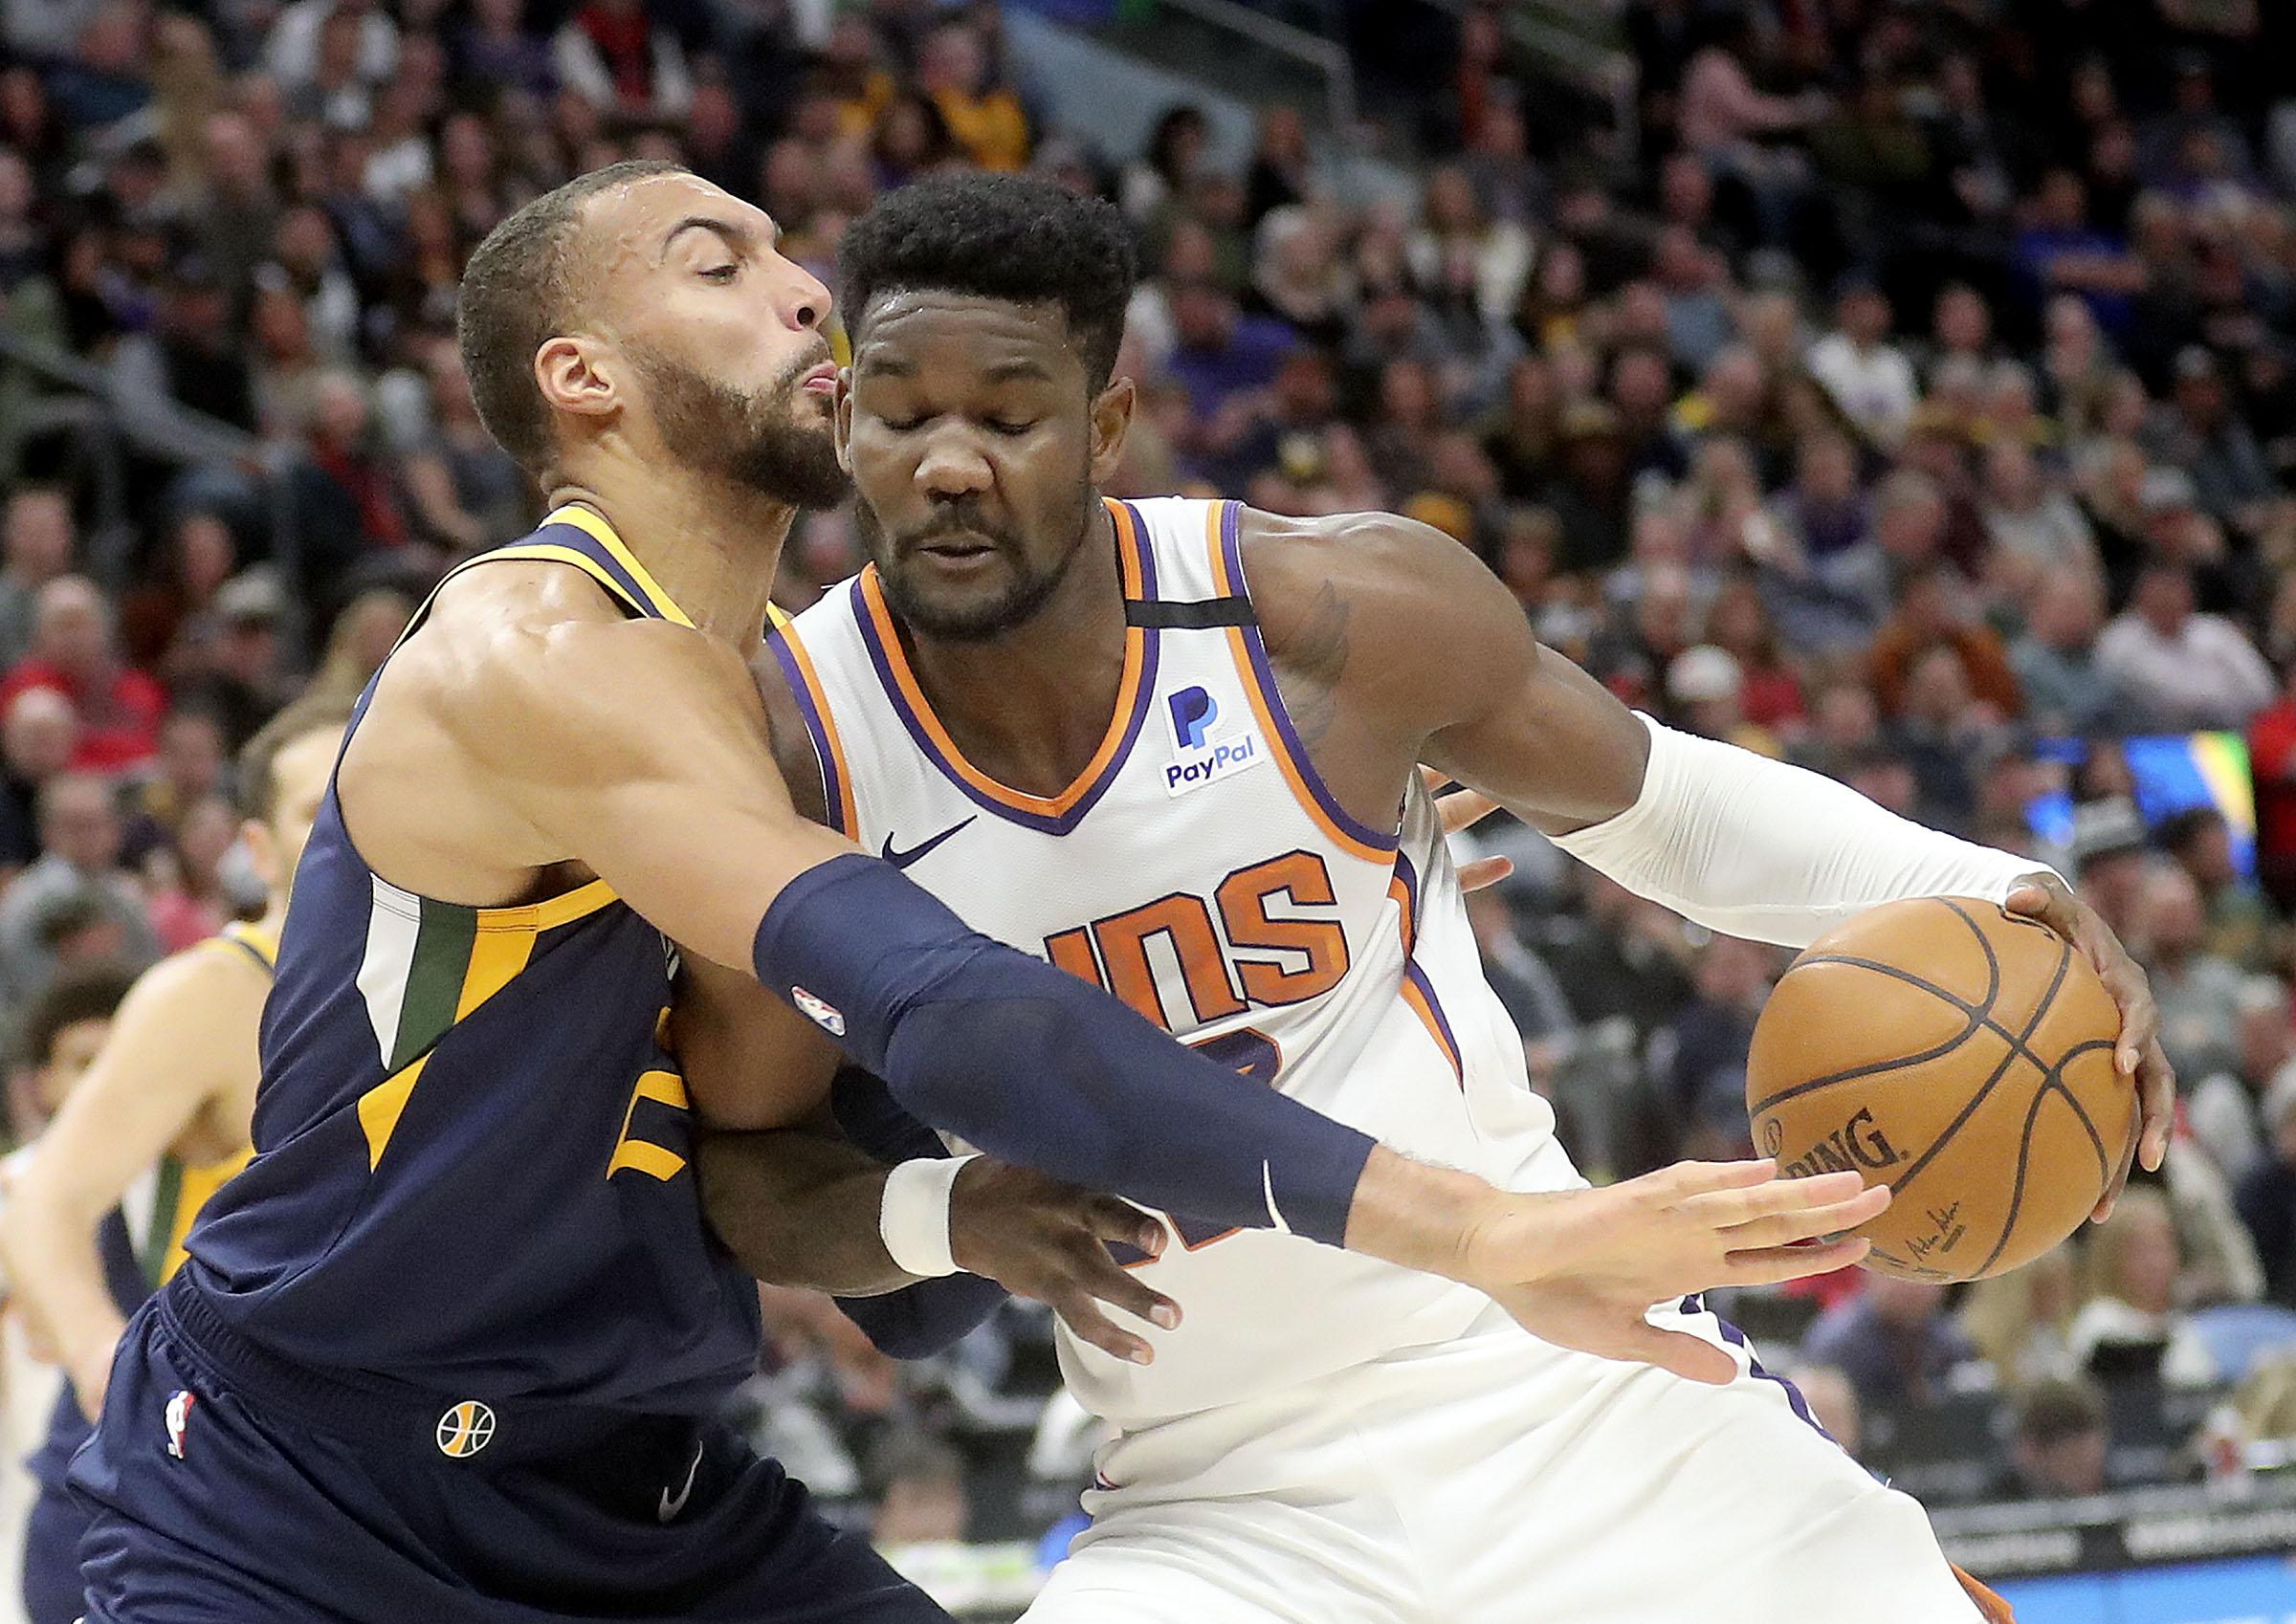 Utah Jazz center Rudy Gobert (27) guards Phoenix Suns center Deandre Ayton (22) during an NBA game at the Vivint Smart Home Arena in Salt Lake City on Monday, Feb. 24, 2020.